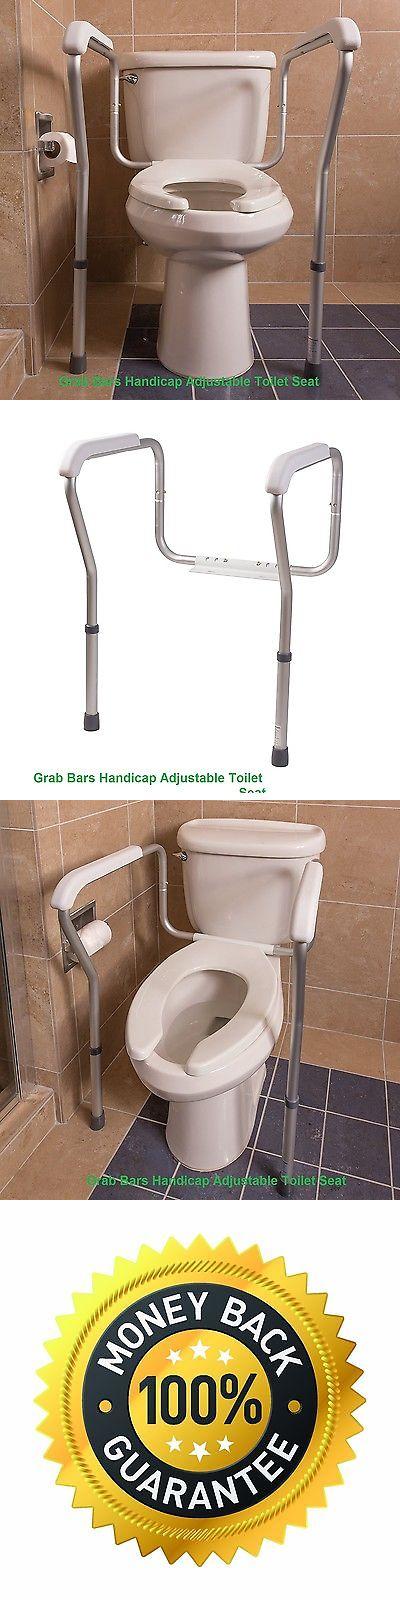 Other Accessibility Fixtures: Handicap Grab Bars Adjustable Toilet ...